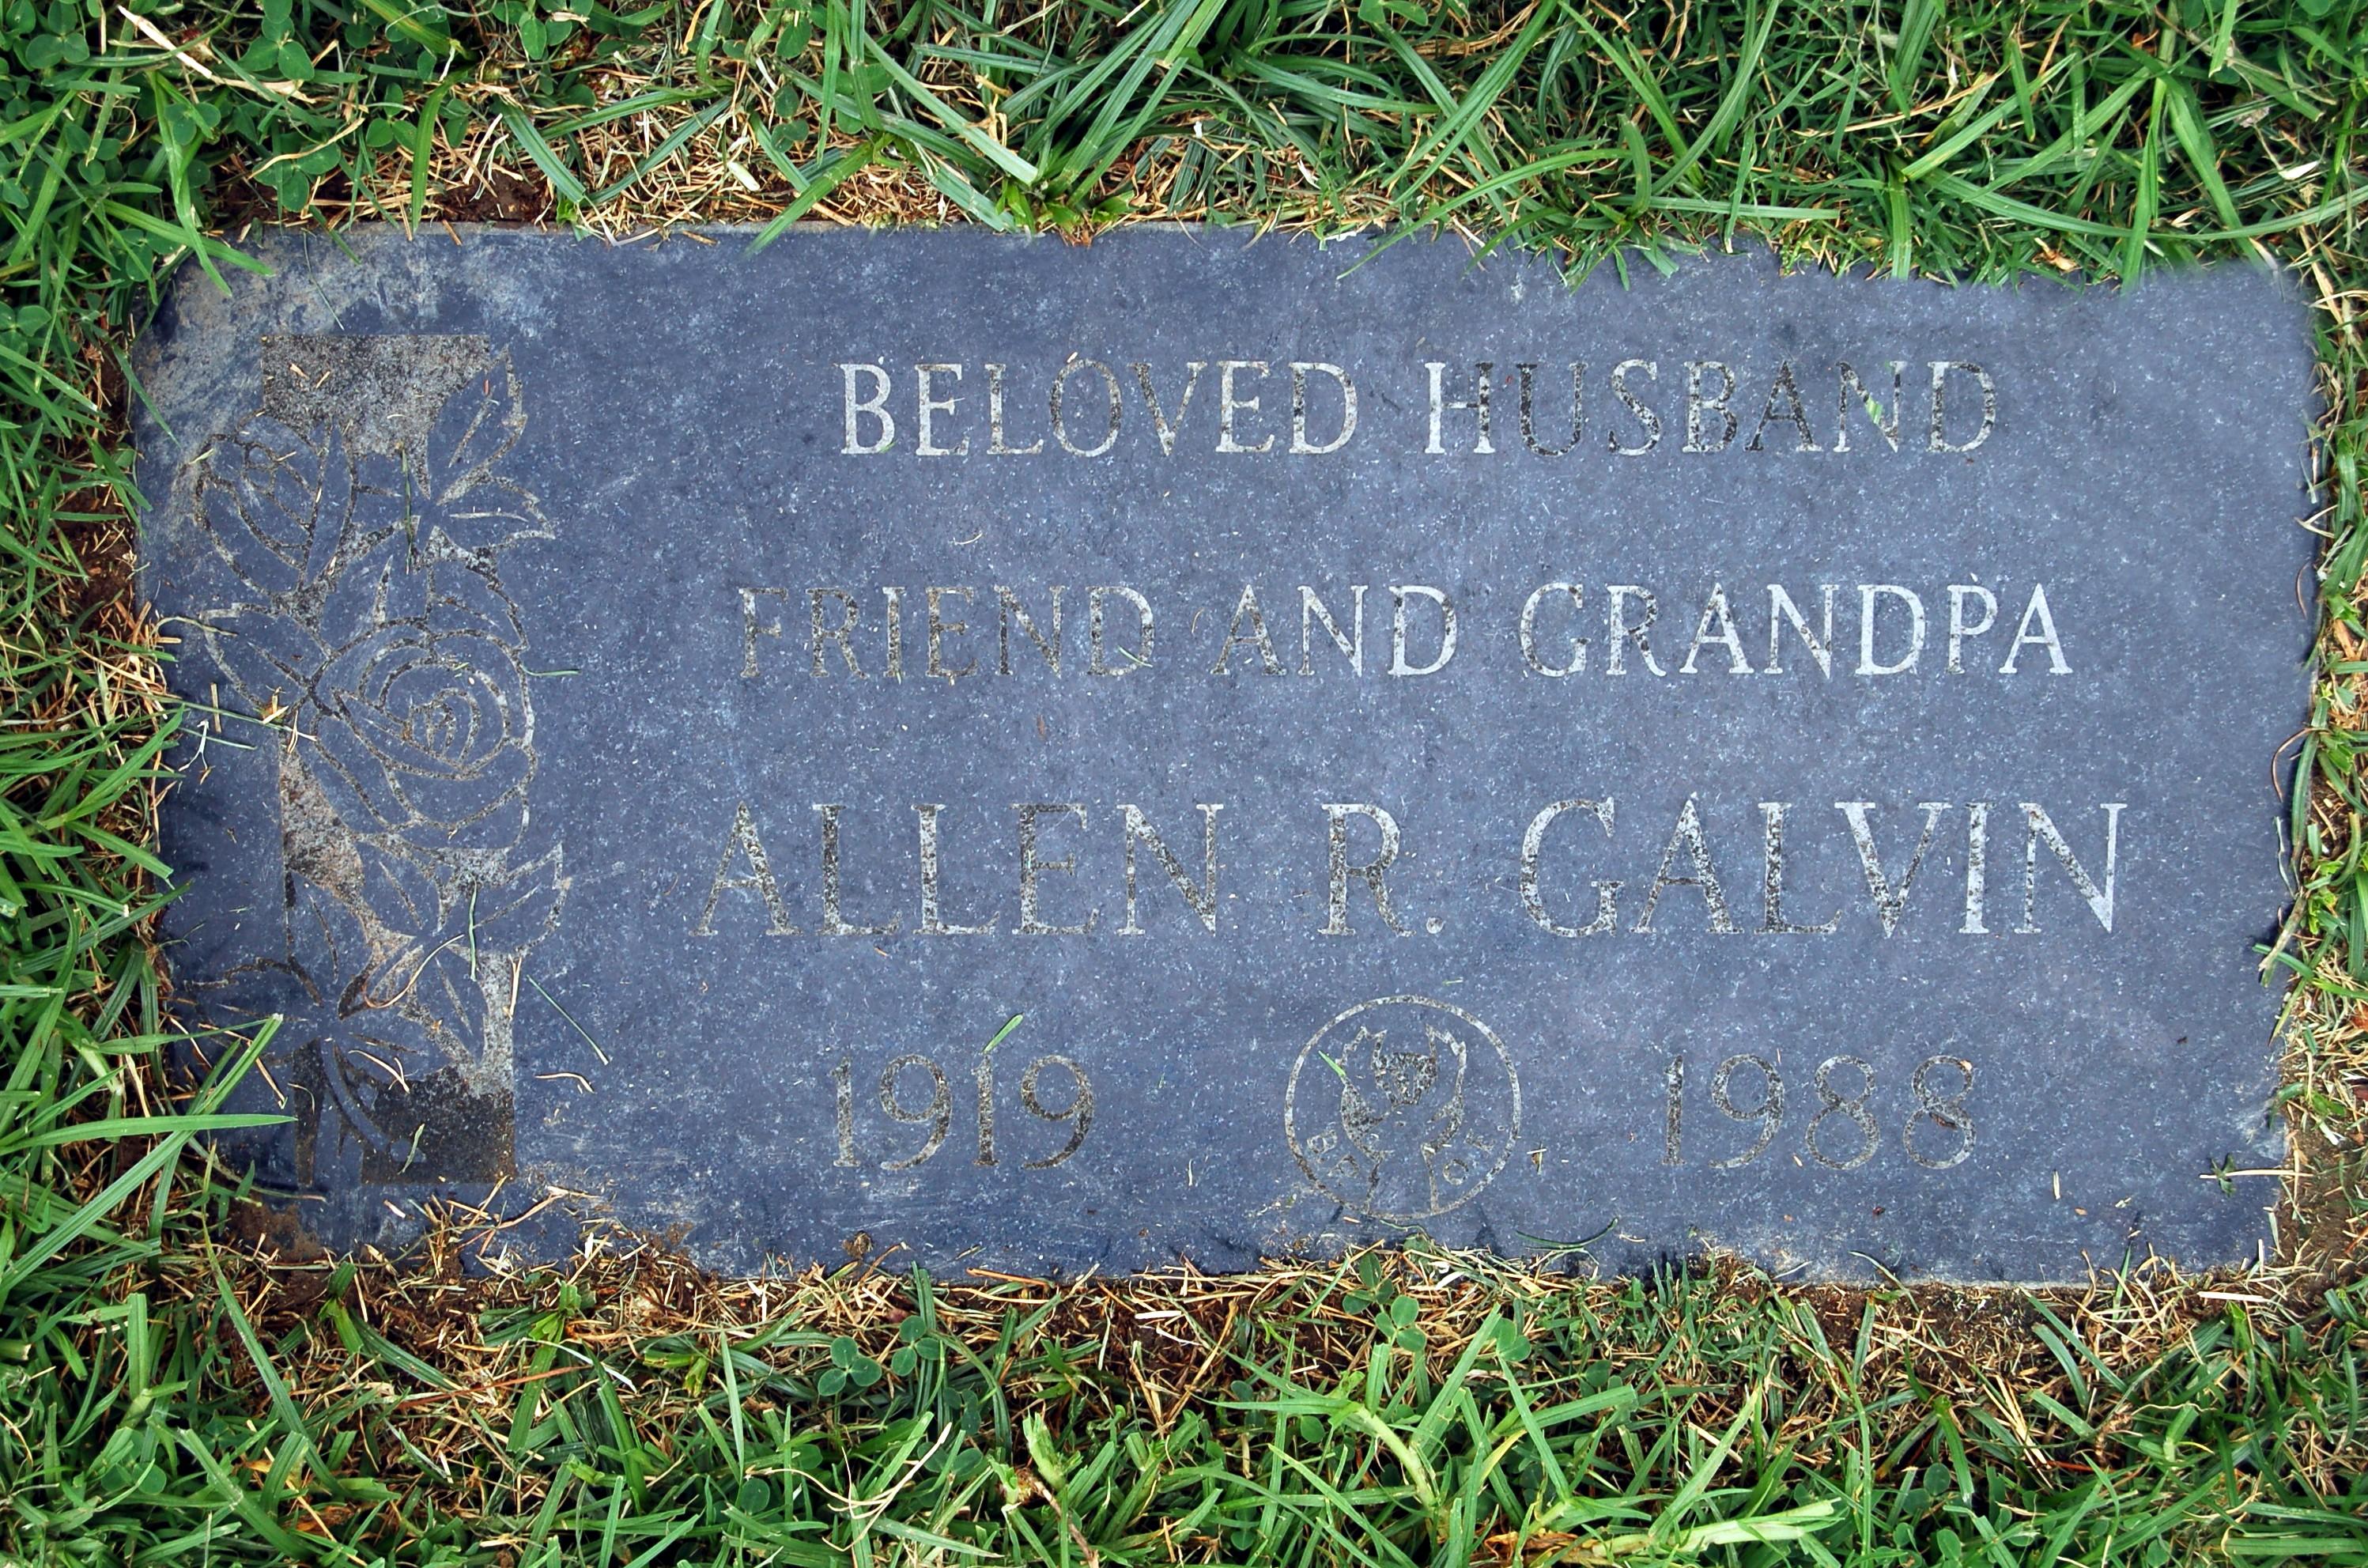 Allen Richard Galvin